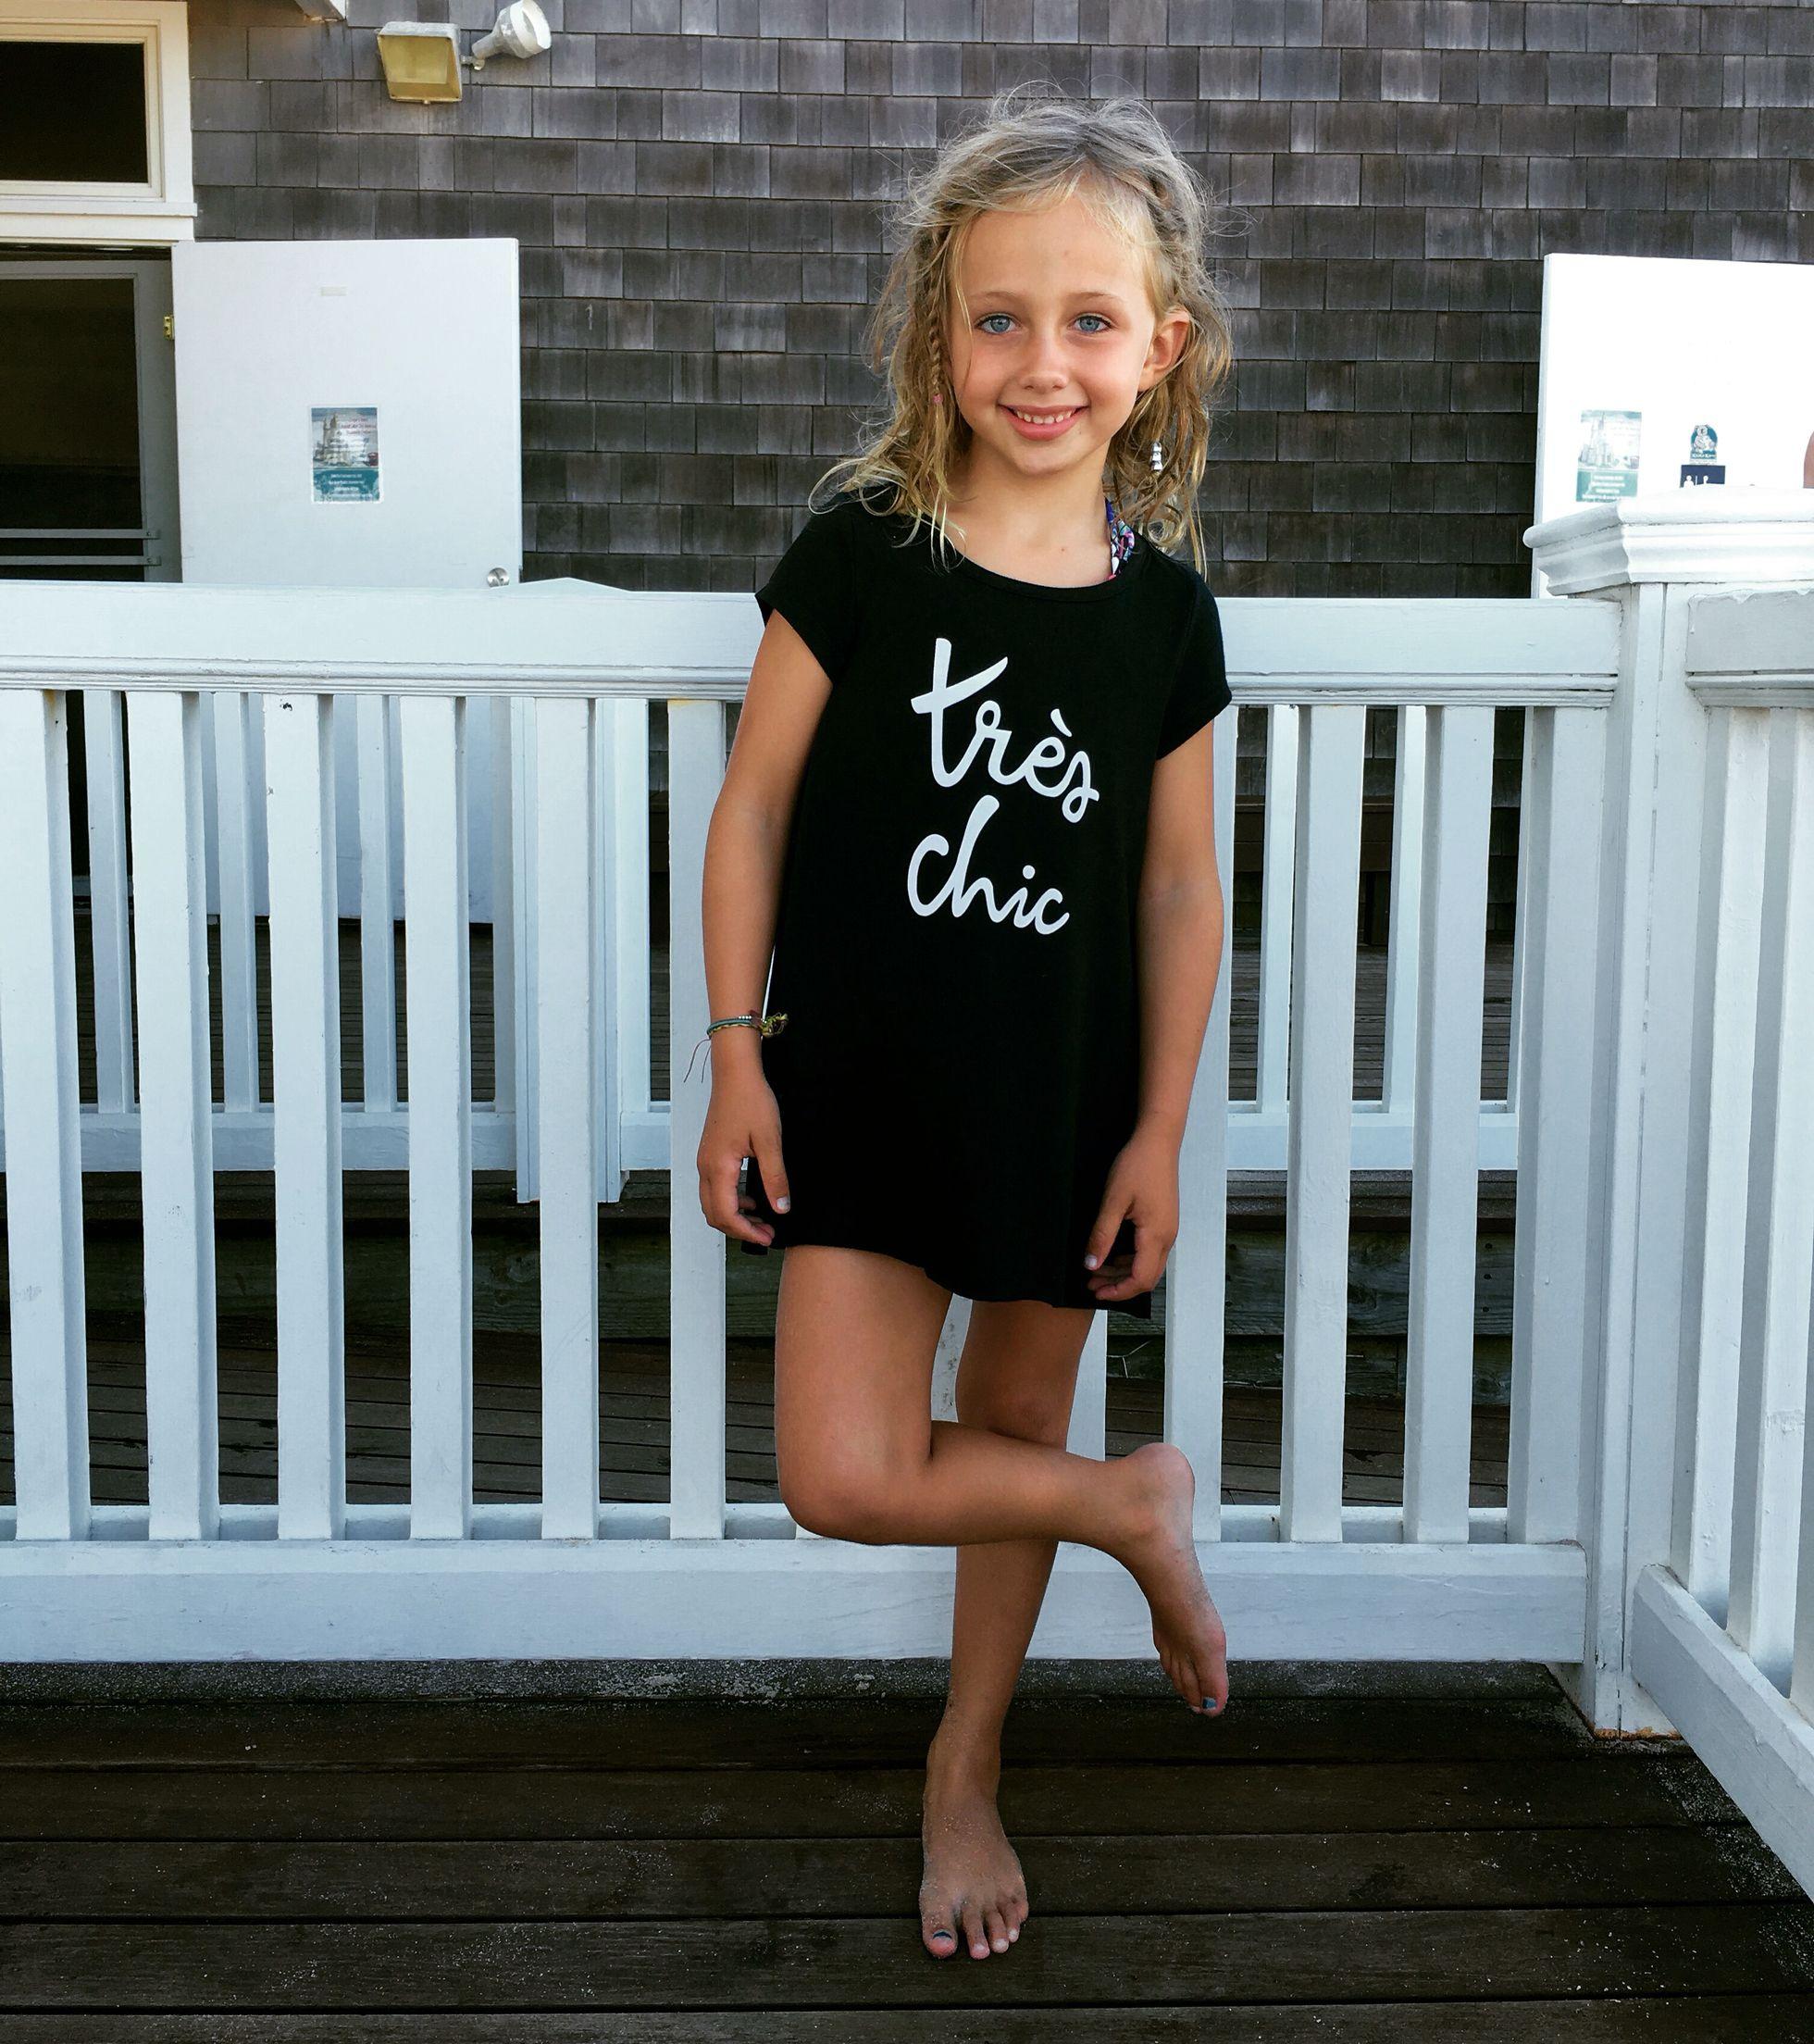 Fabkids Tr Chic Black T-shirt Dress #fashionista #